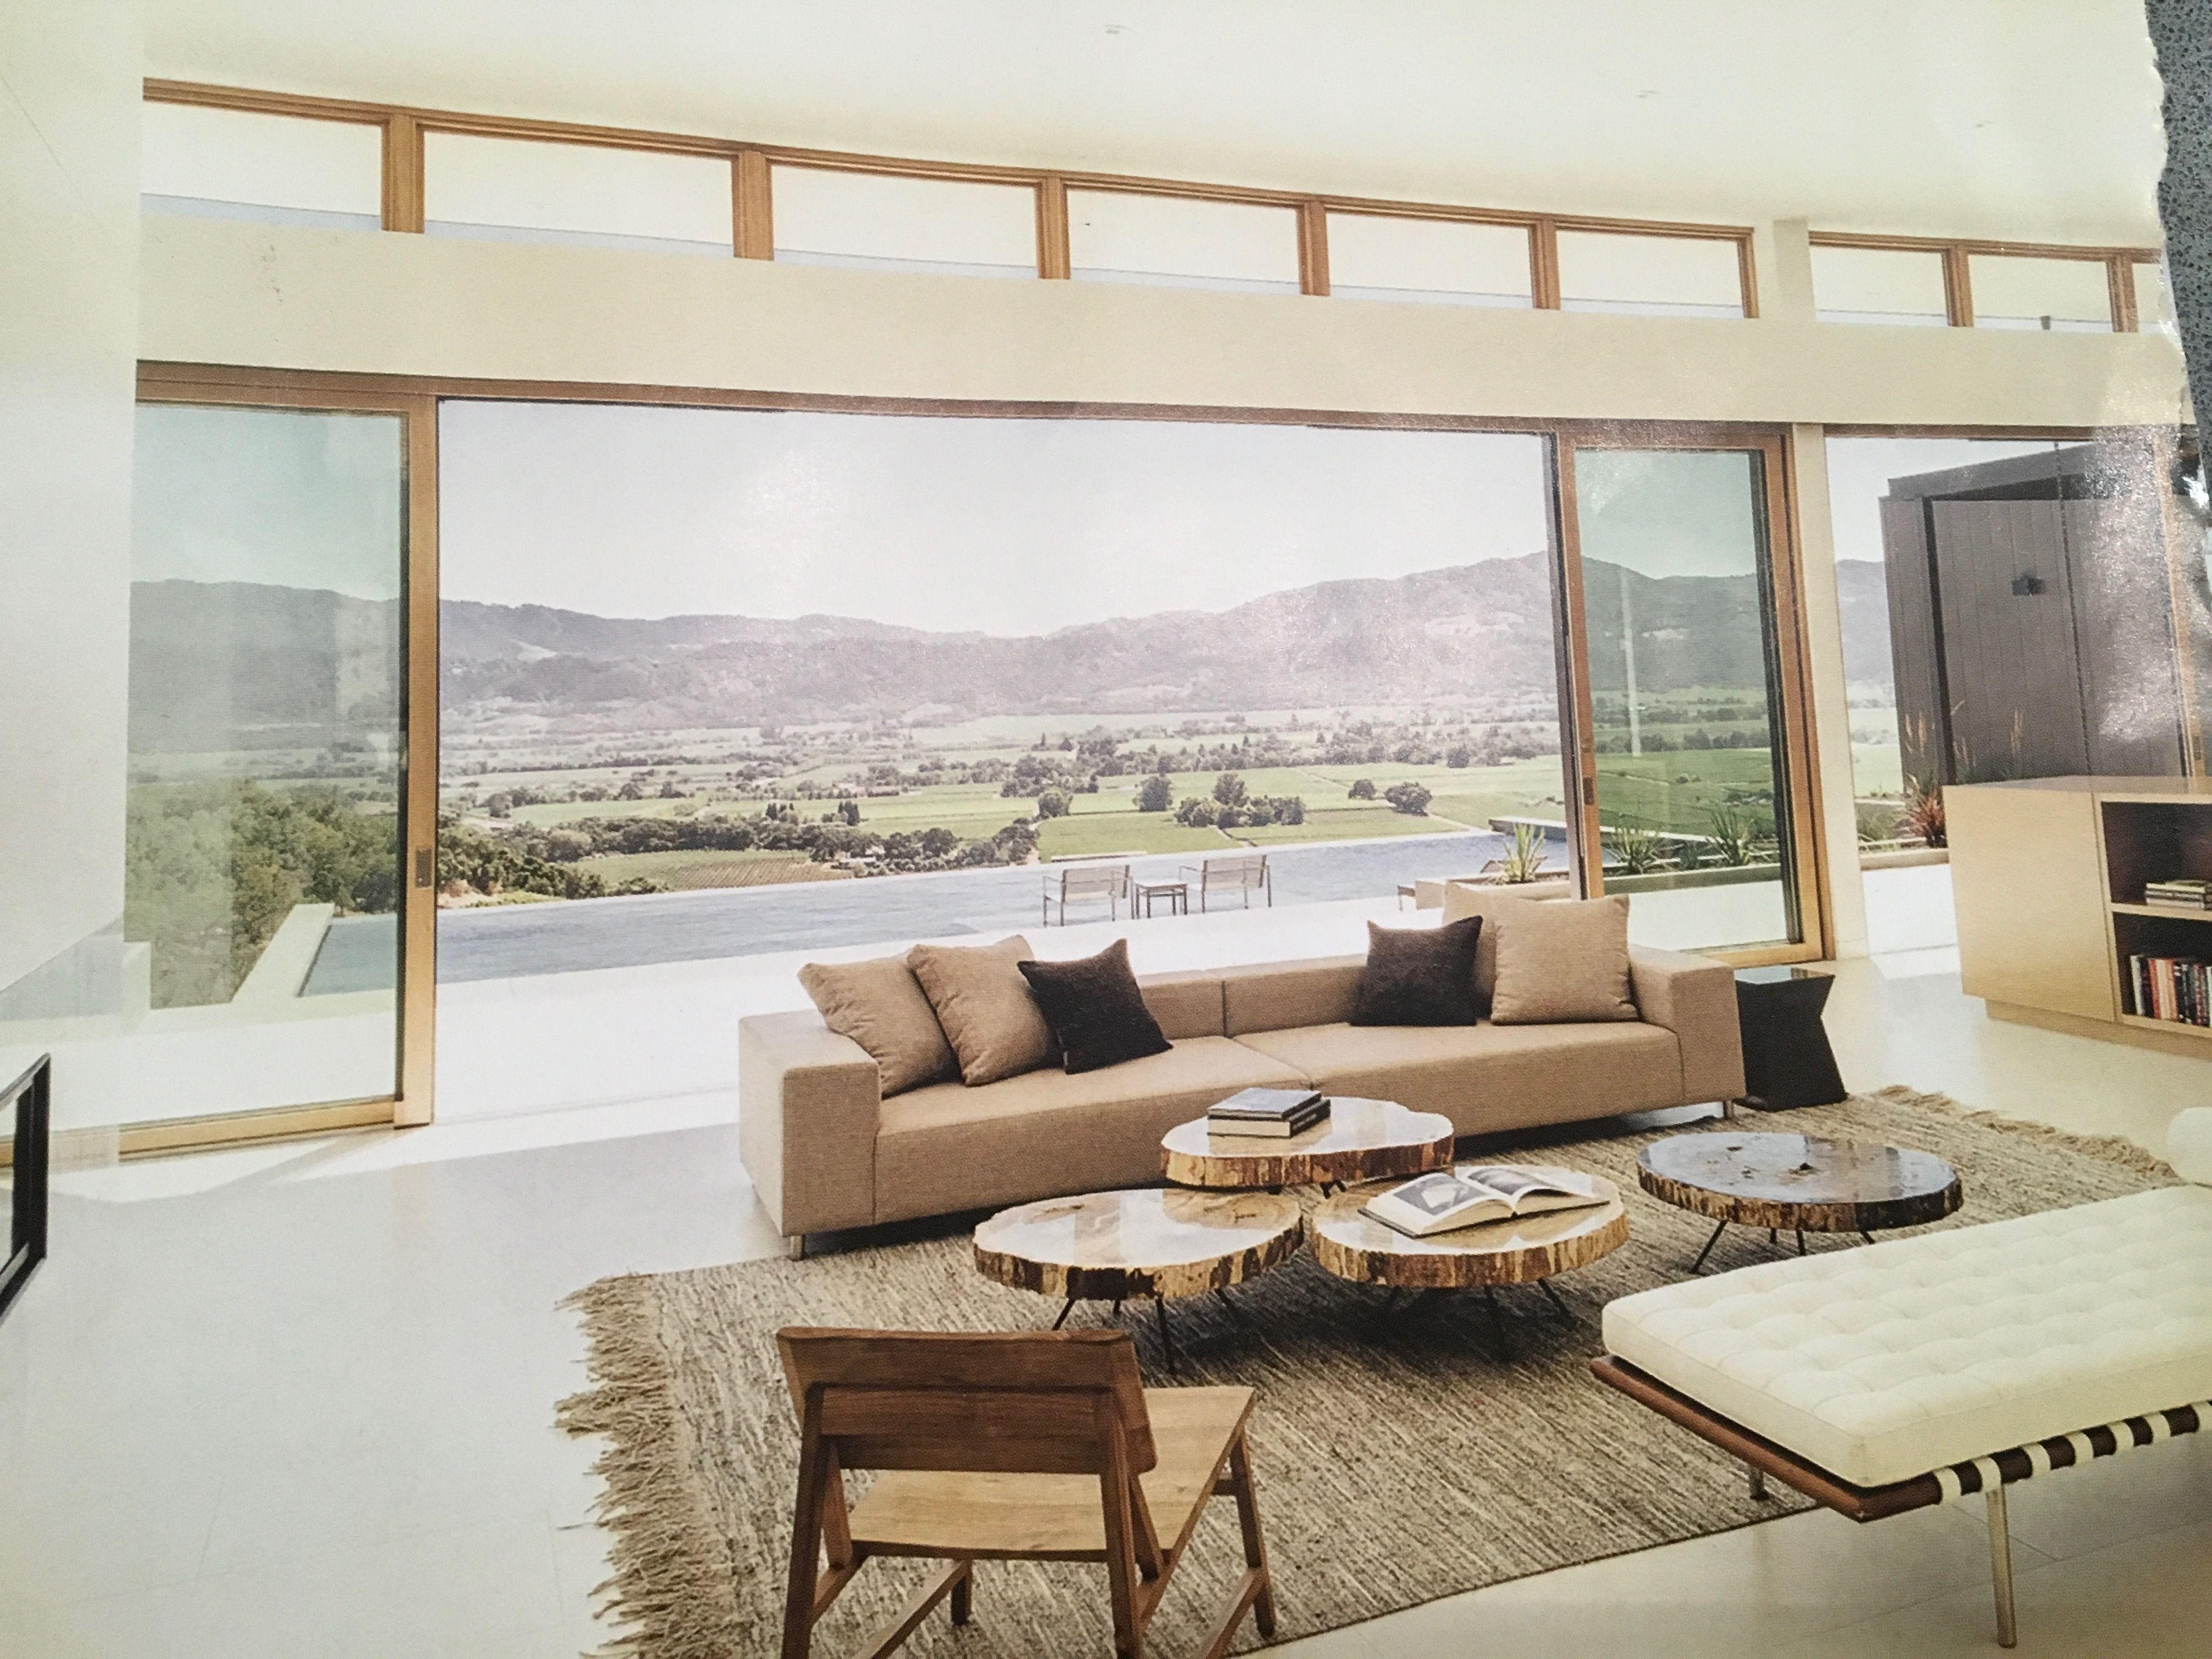 Idea by Mimi Fogle on Home Arizona Living * Dining ...